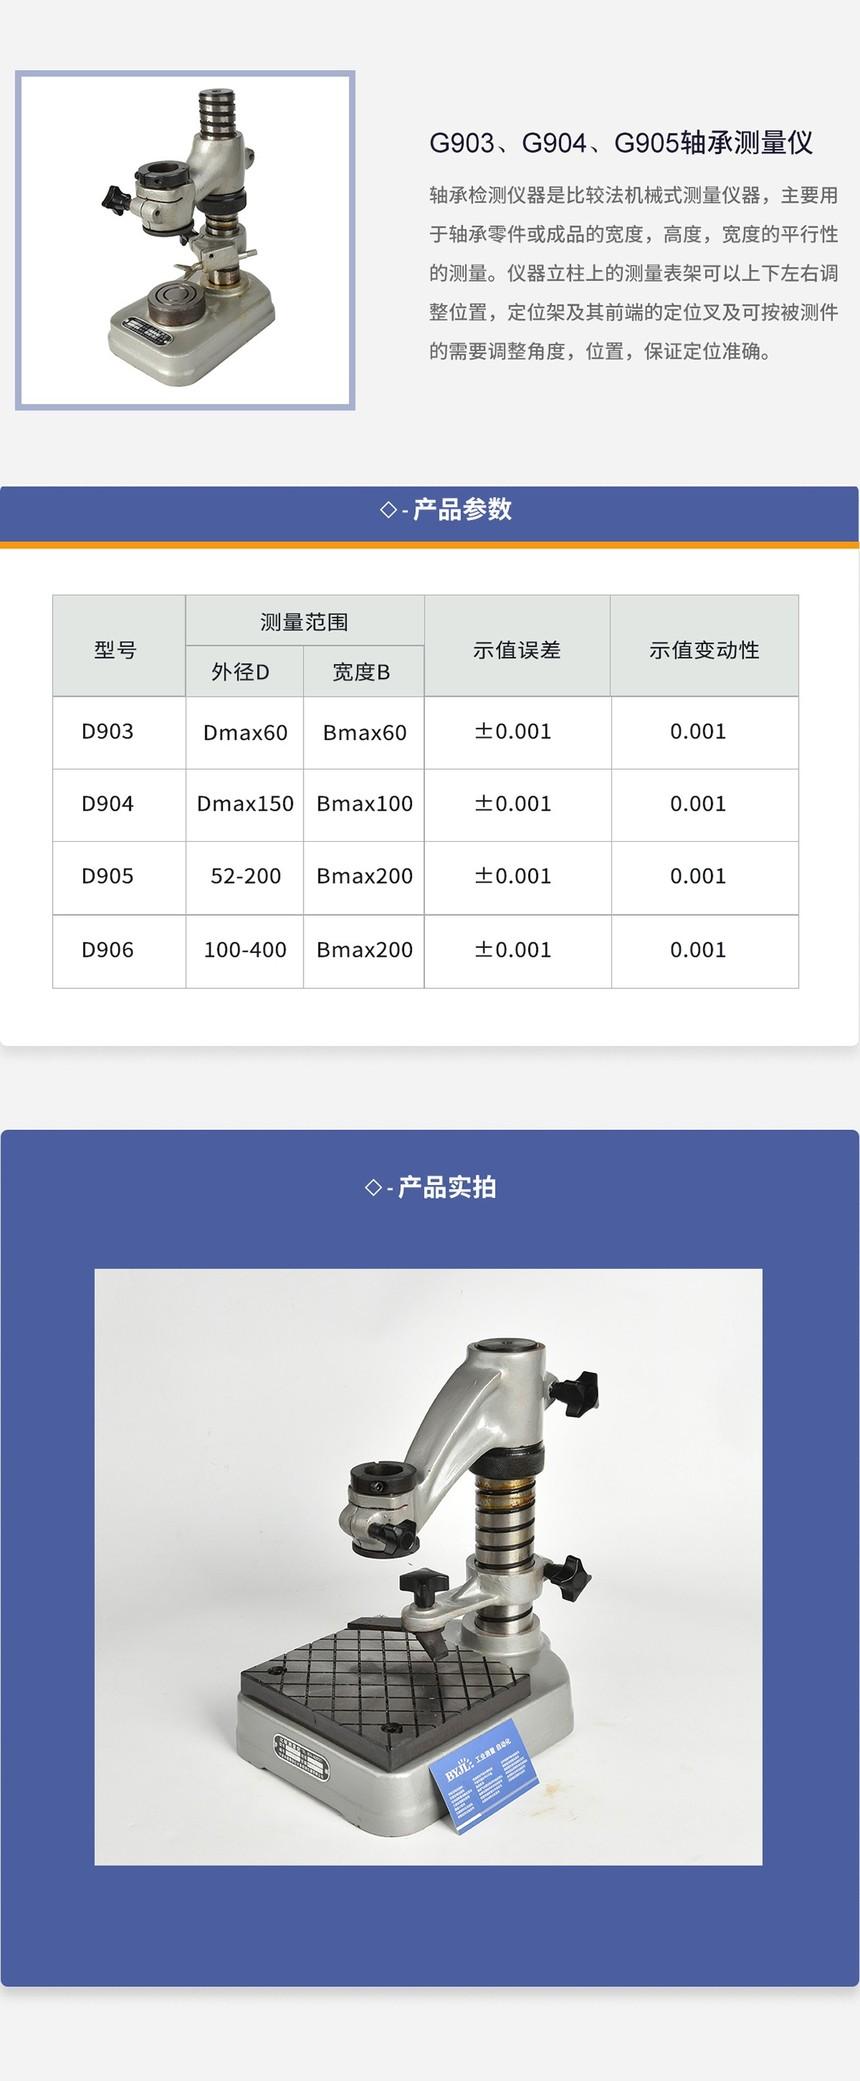 G903、G904、G905轴承测量仪_02.jpg